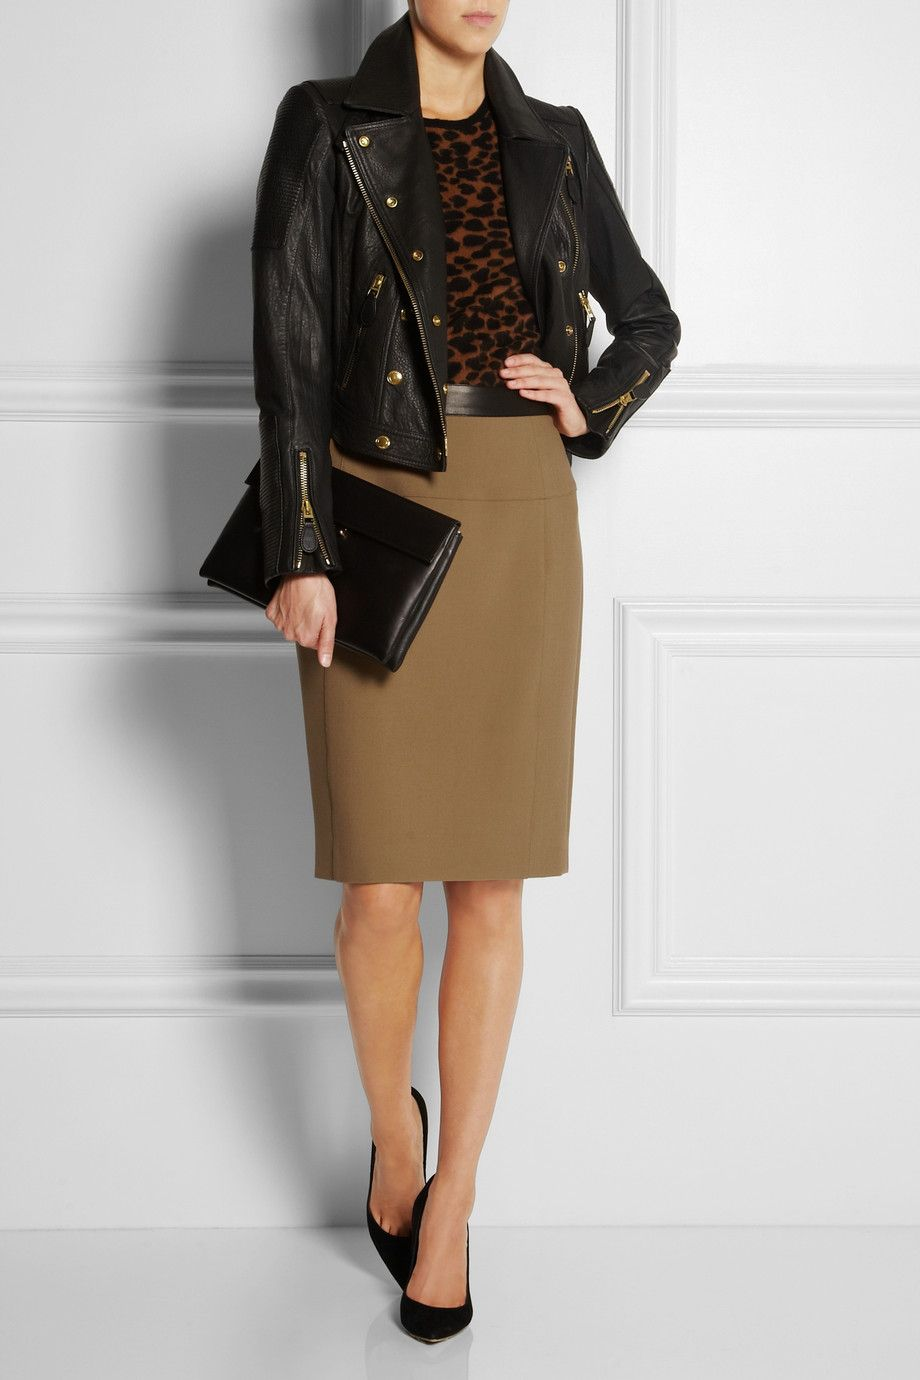 235c00063b7e79 BURBERRY LONDON Leather-trimmed stretch-crepe pencil skirt $550, Burberry  Brit jacket, Burberry Prorsum top, Fendi cuff Gianvito Rossi shoes, Marni  clutch.